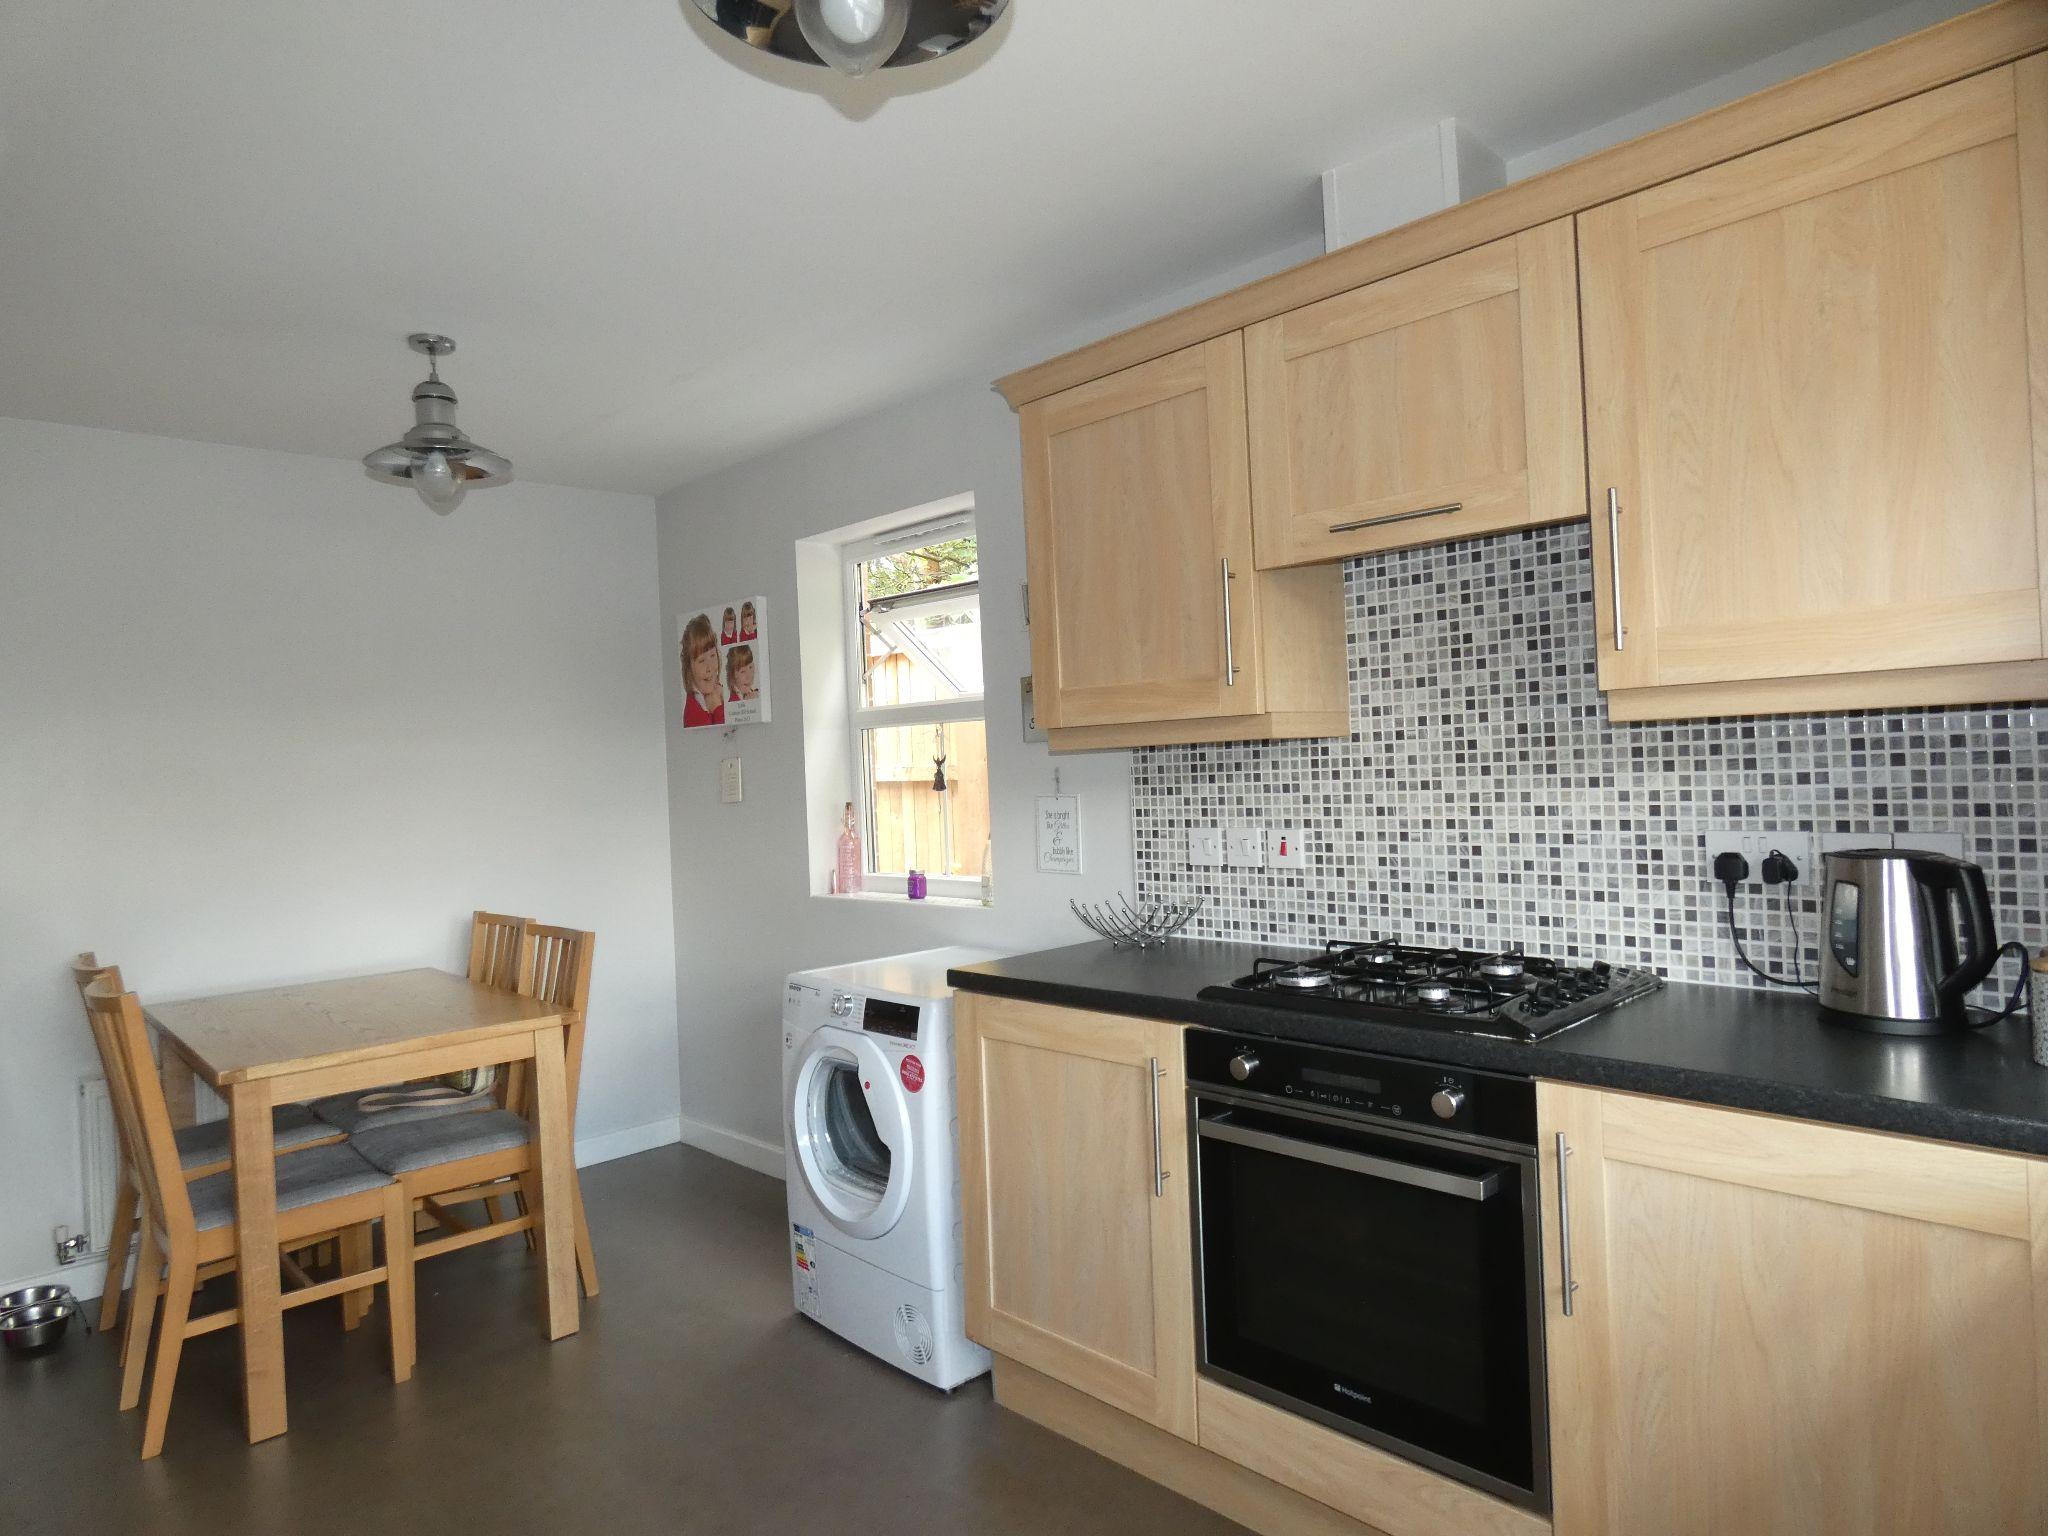 3 bedroom semi-detached house For Sale in Bishop Auckland - Kitchen Diner.